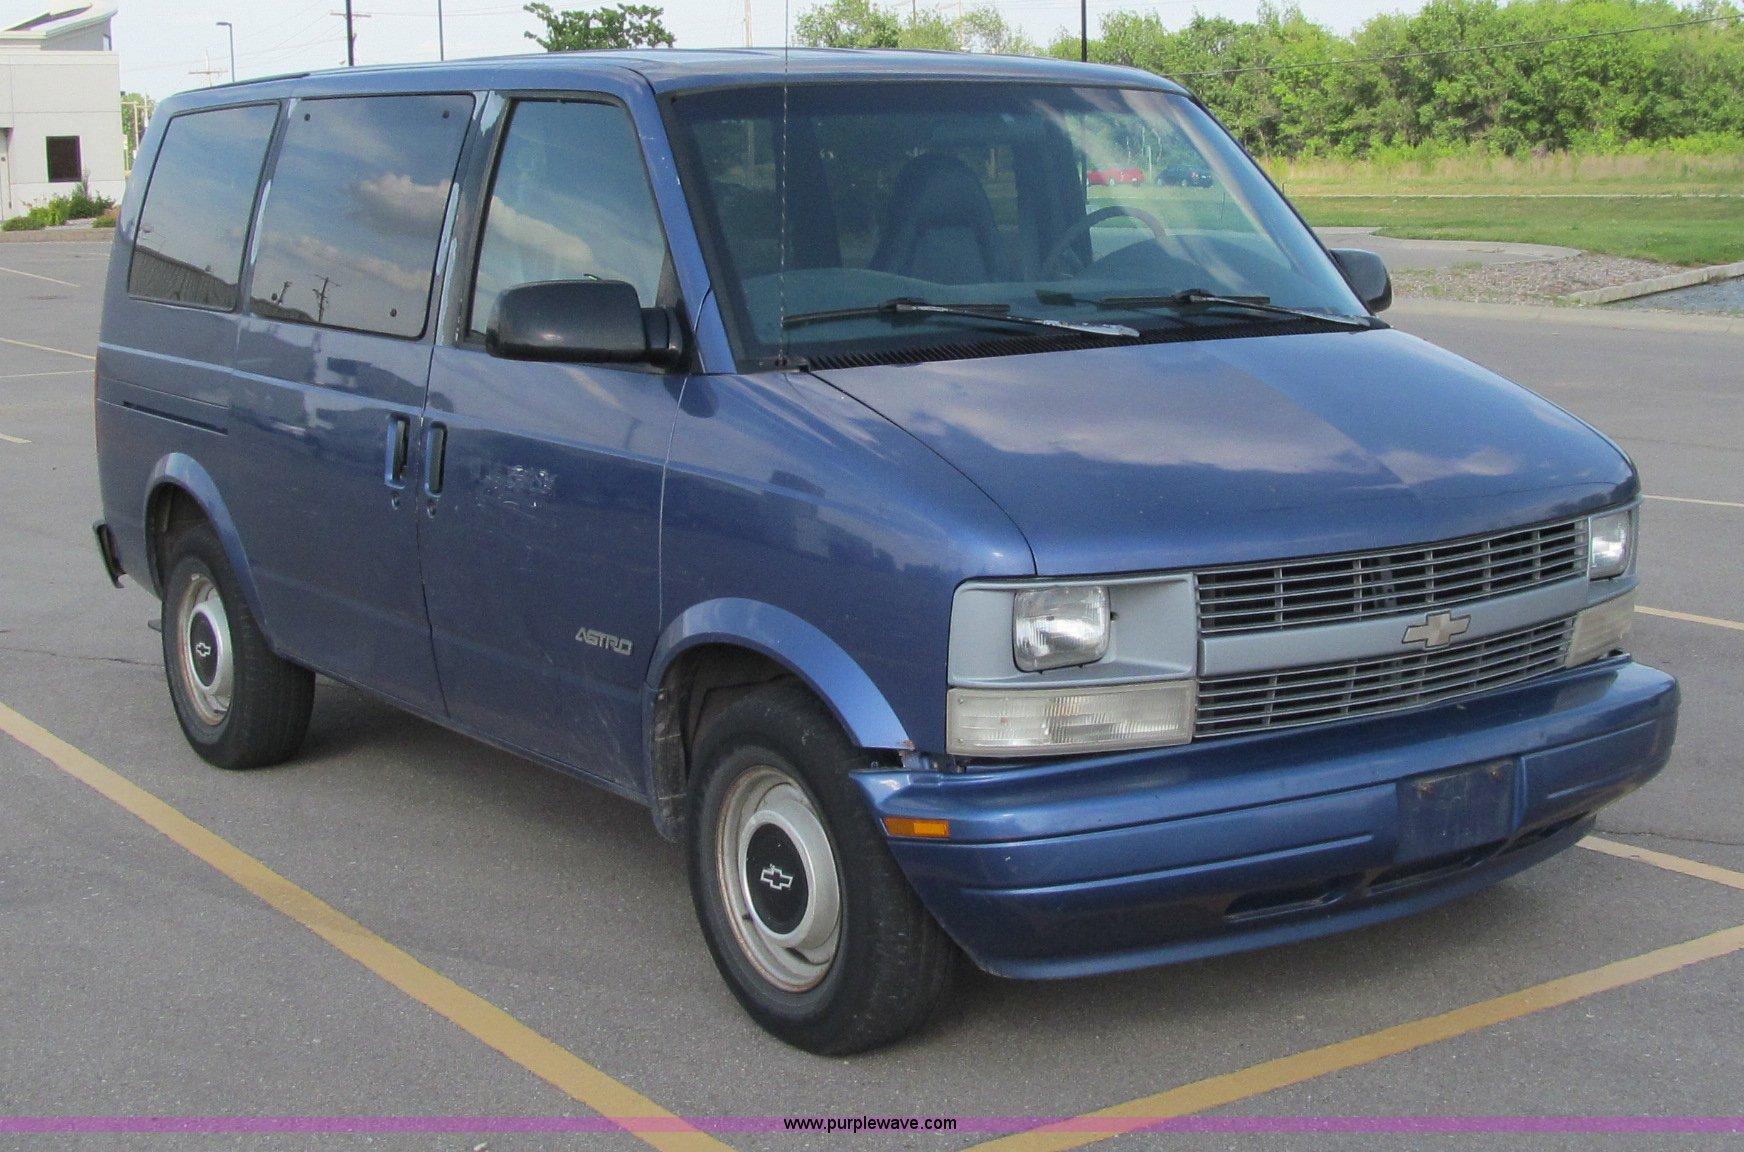 1996 chevrolet astro van item m9250 sold july 10 govern rh purplewave com 1998 Chevy Astro Van 1998 Chevy Astro Van